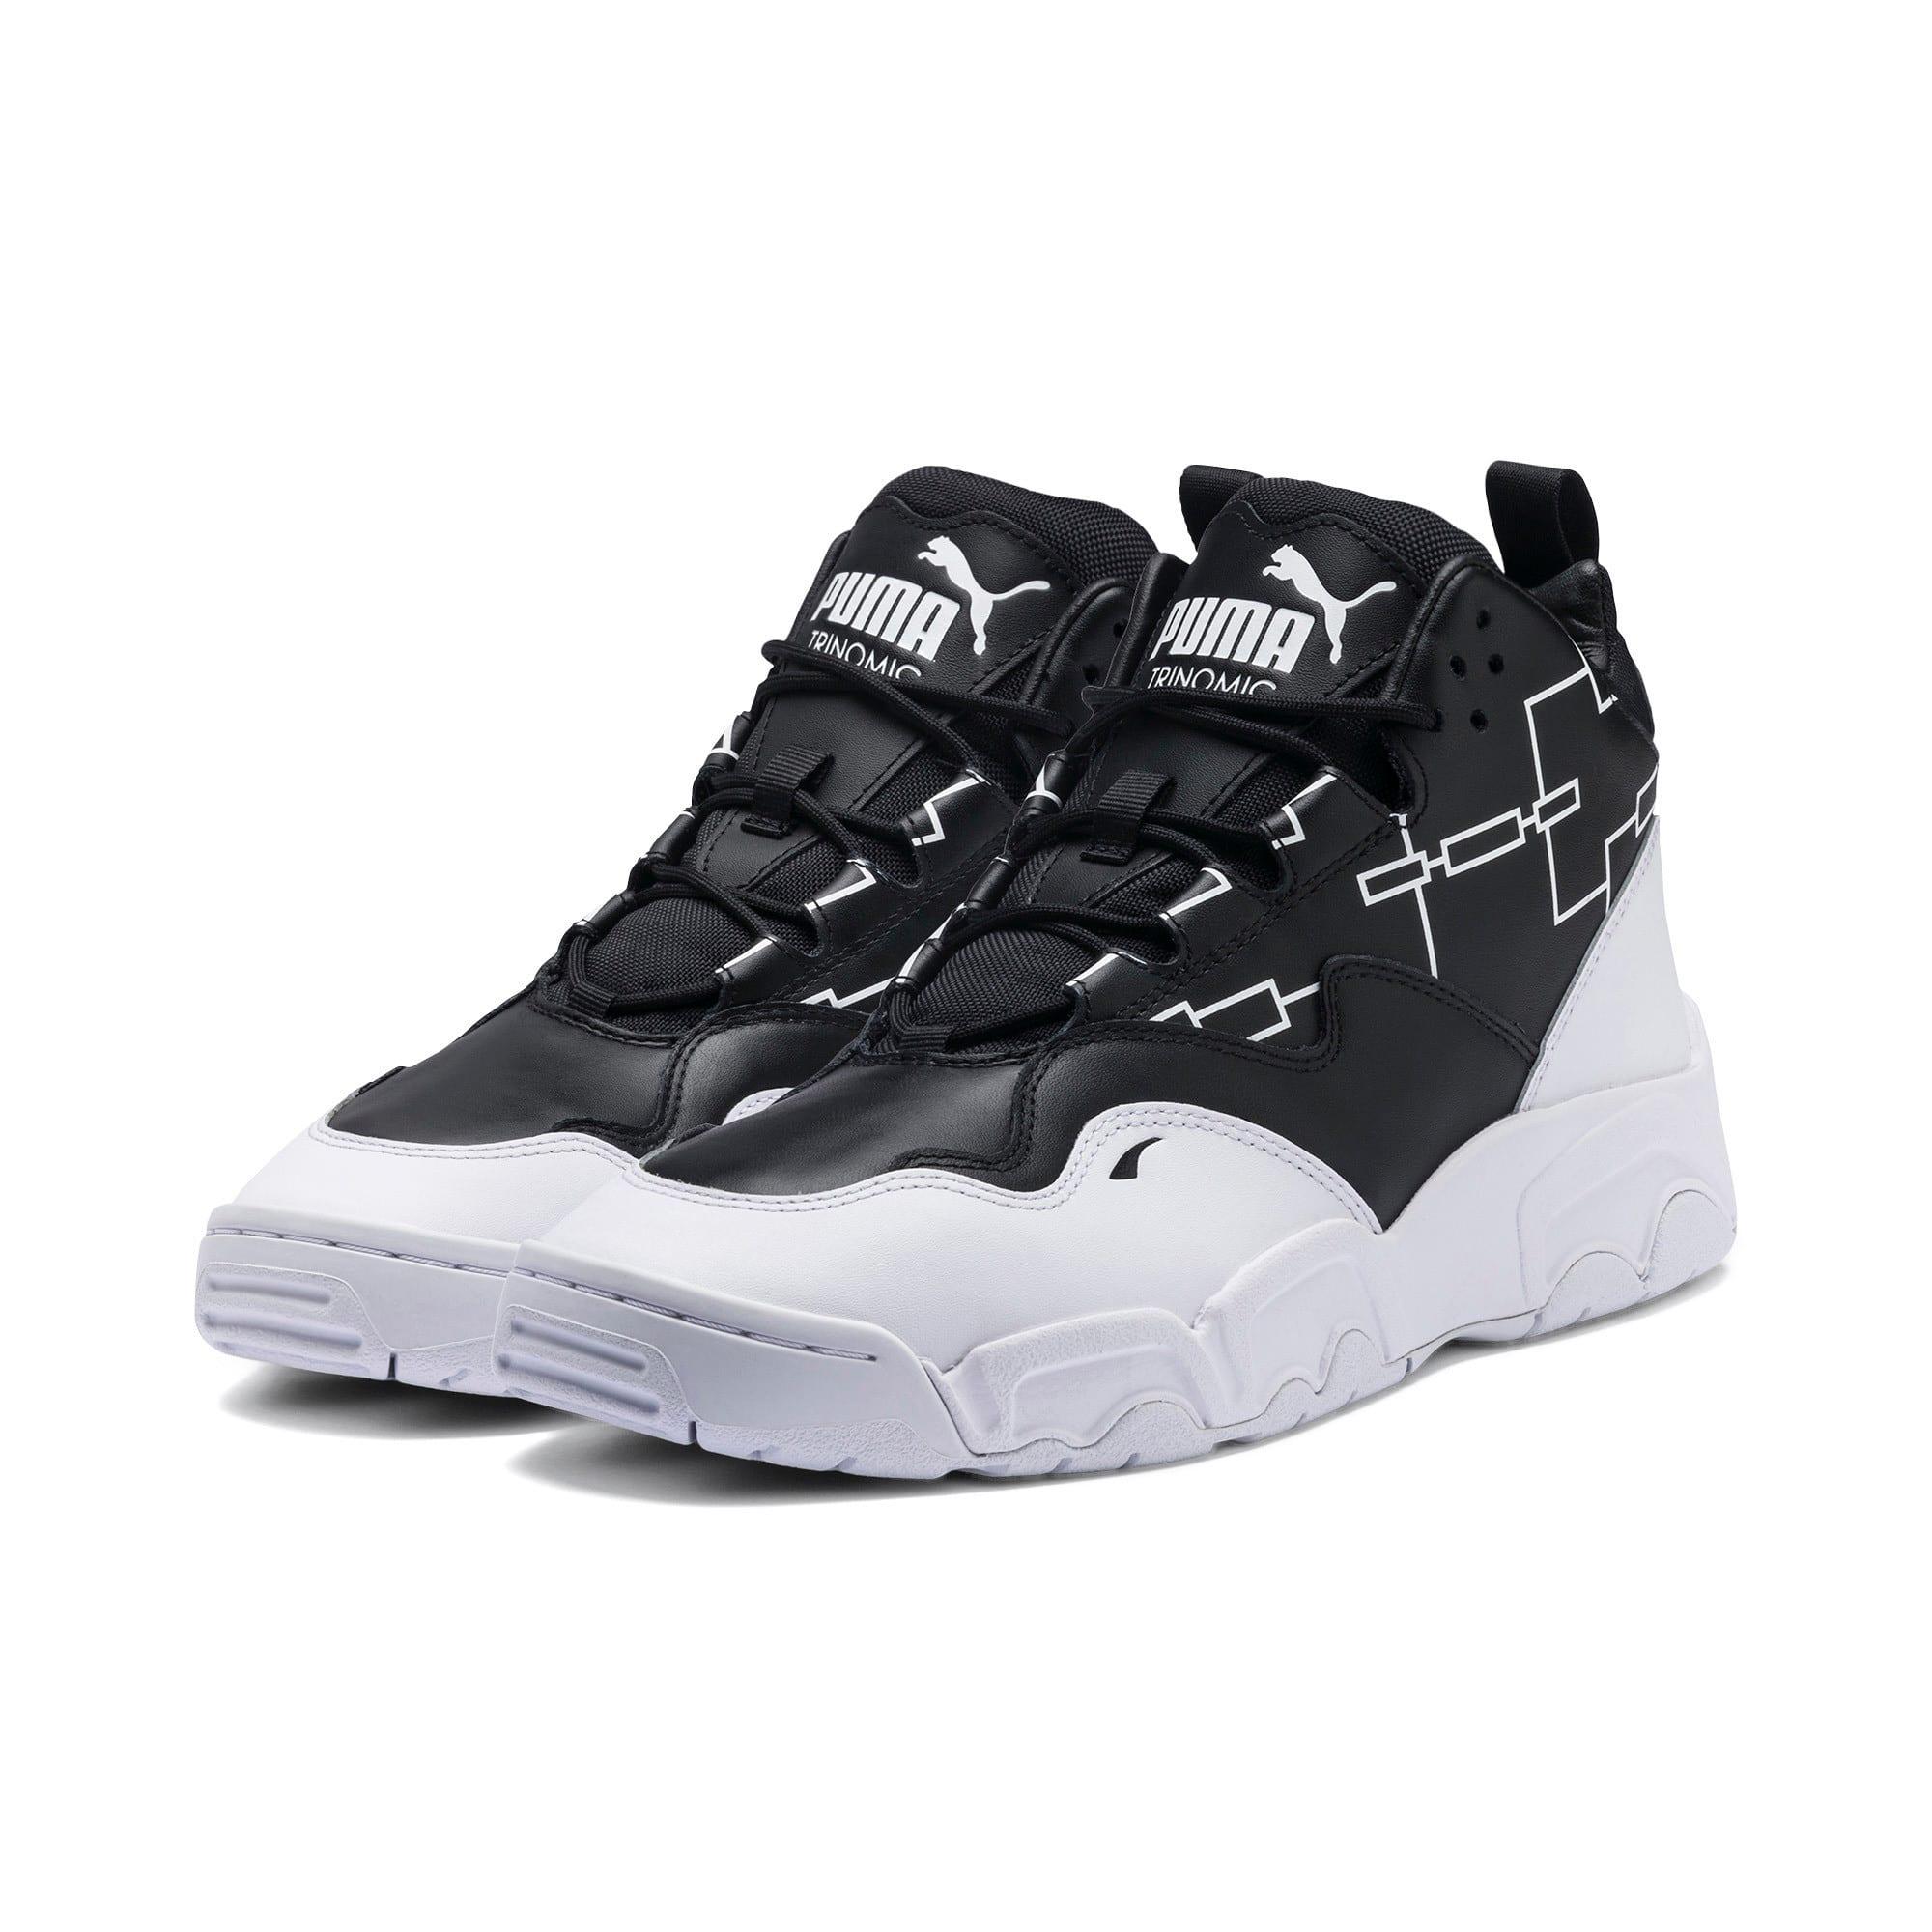 Thumbnail 2 of Source Mid Bracket Sneakers, Puma Black-Puma White, medium